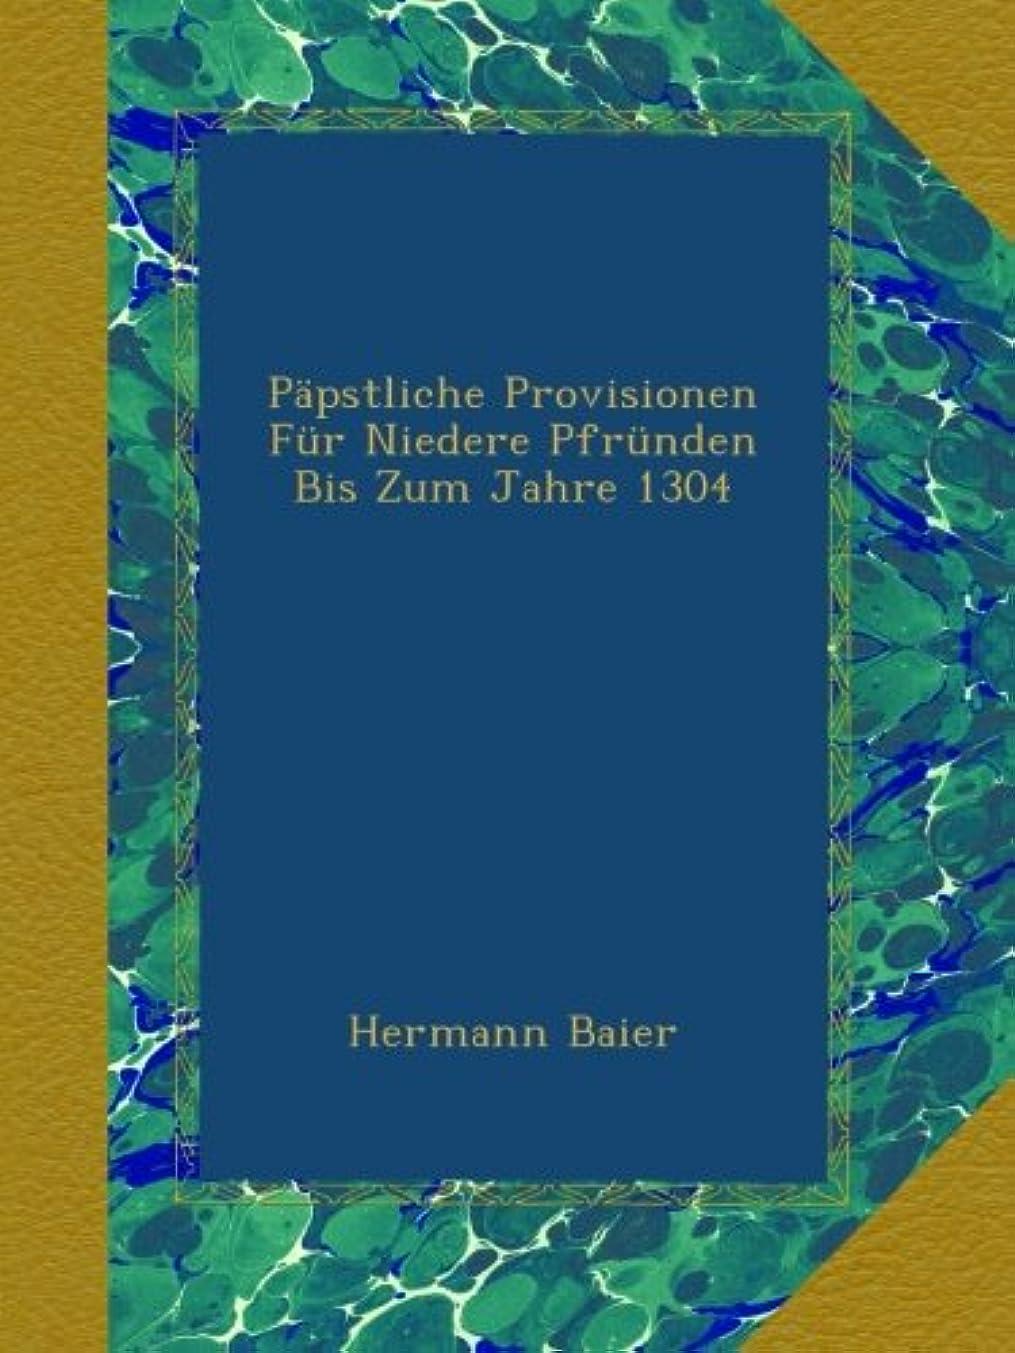 辞任洗練検証Paepstliche Provisionen Fuer Niedere Pfruenden Bis Zum Jahre 1304